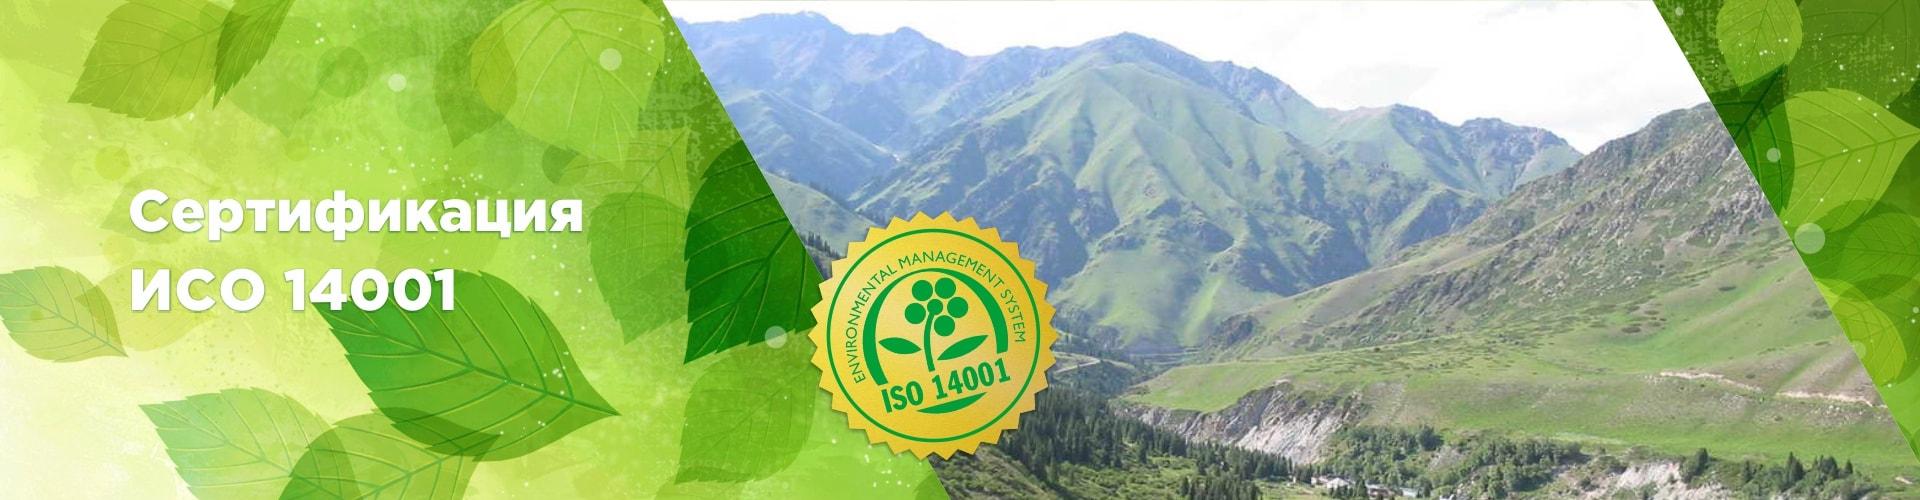 Сертификация 14001 Алматы